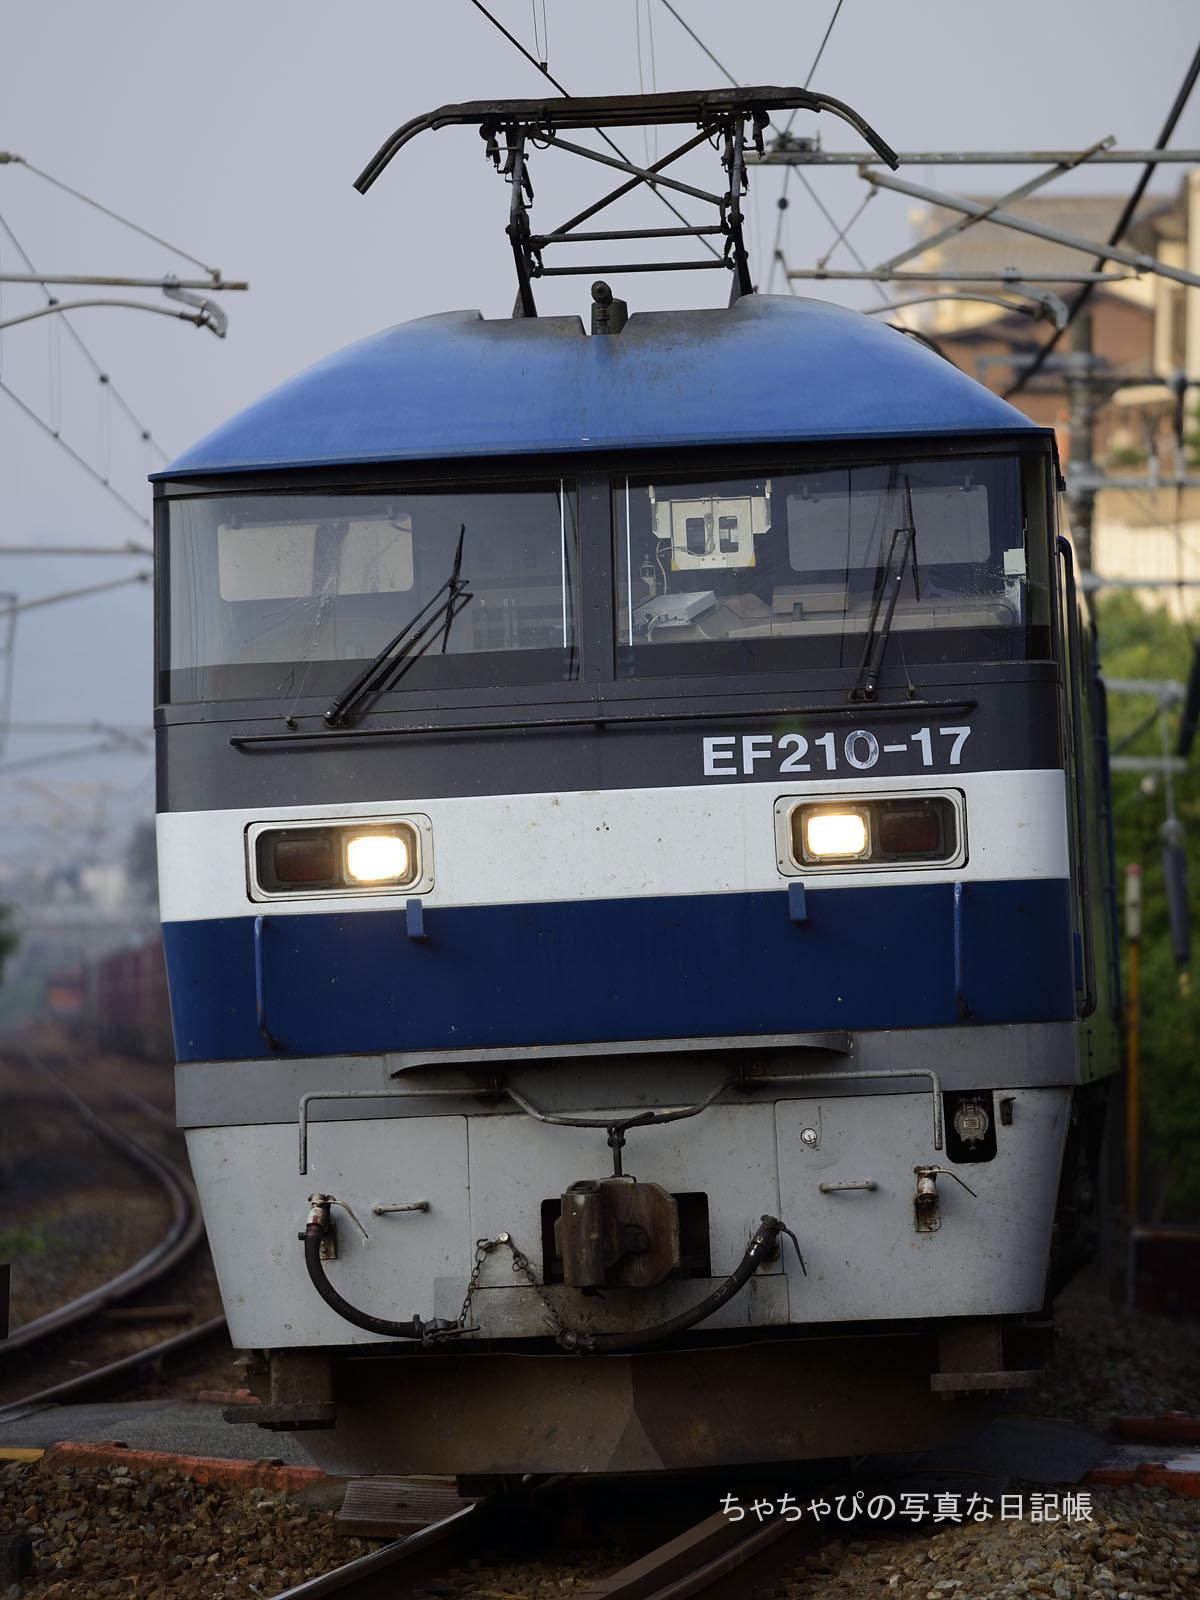 1054レ、EF210-17 中野東駅~瀬野駅